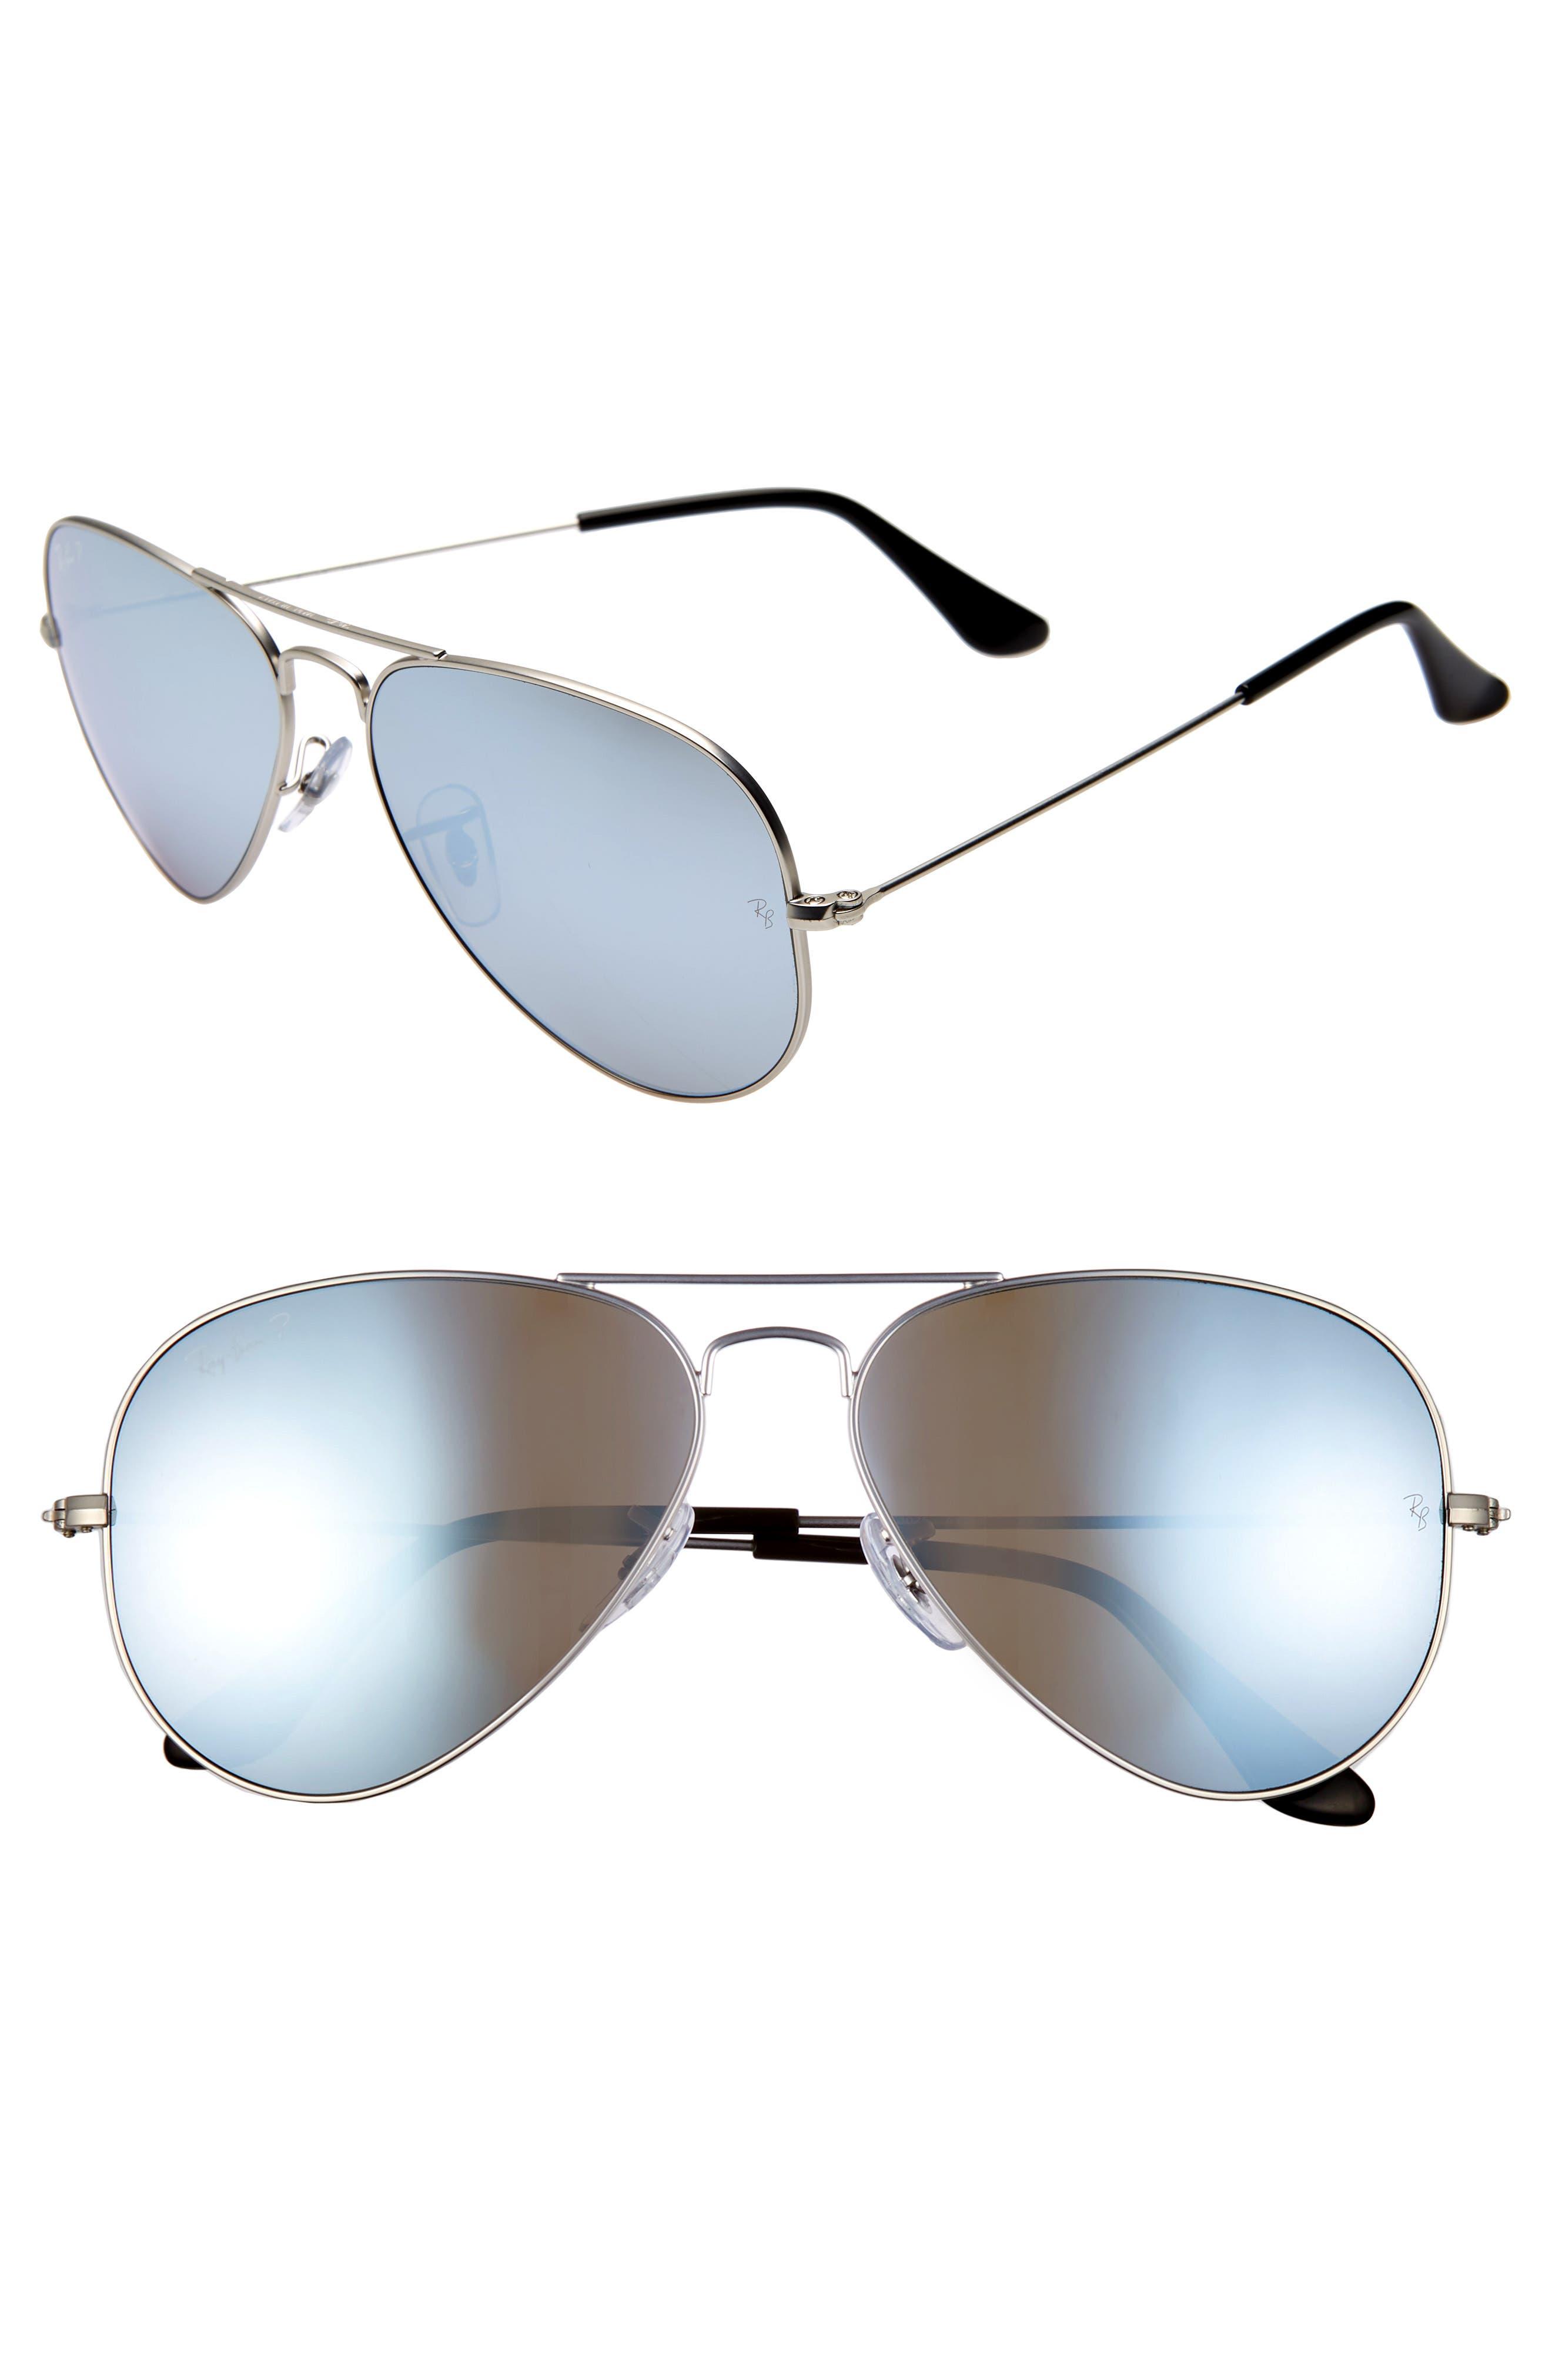 Ray-Ban Standard Icons 5m Mirrored Polarized Aviator Sunglasses - Silver/ Silver Mirror